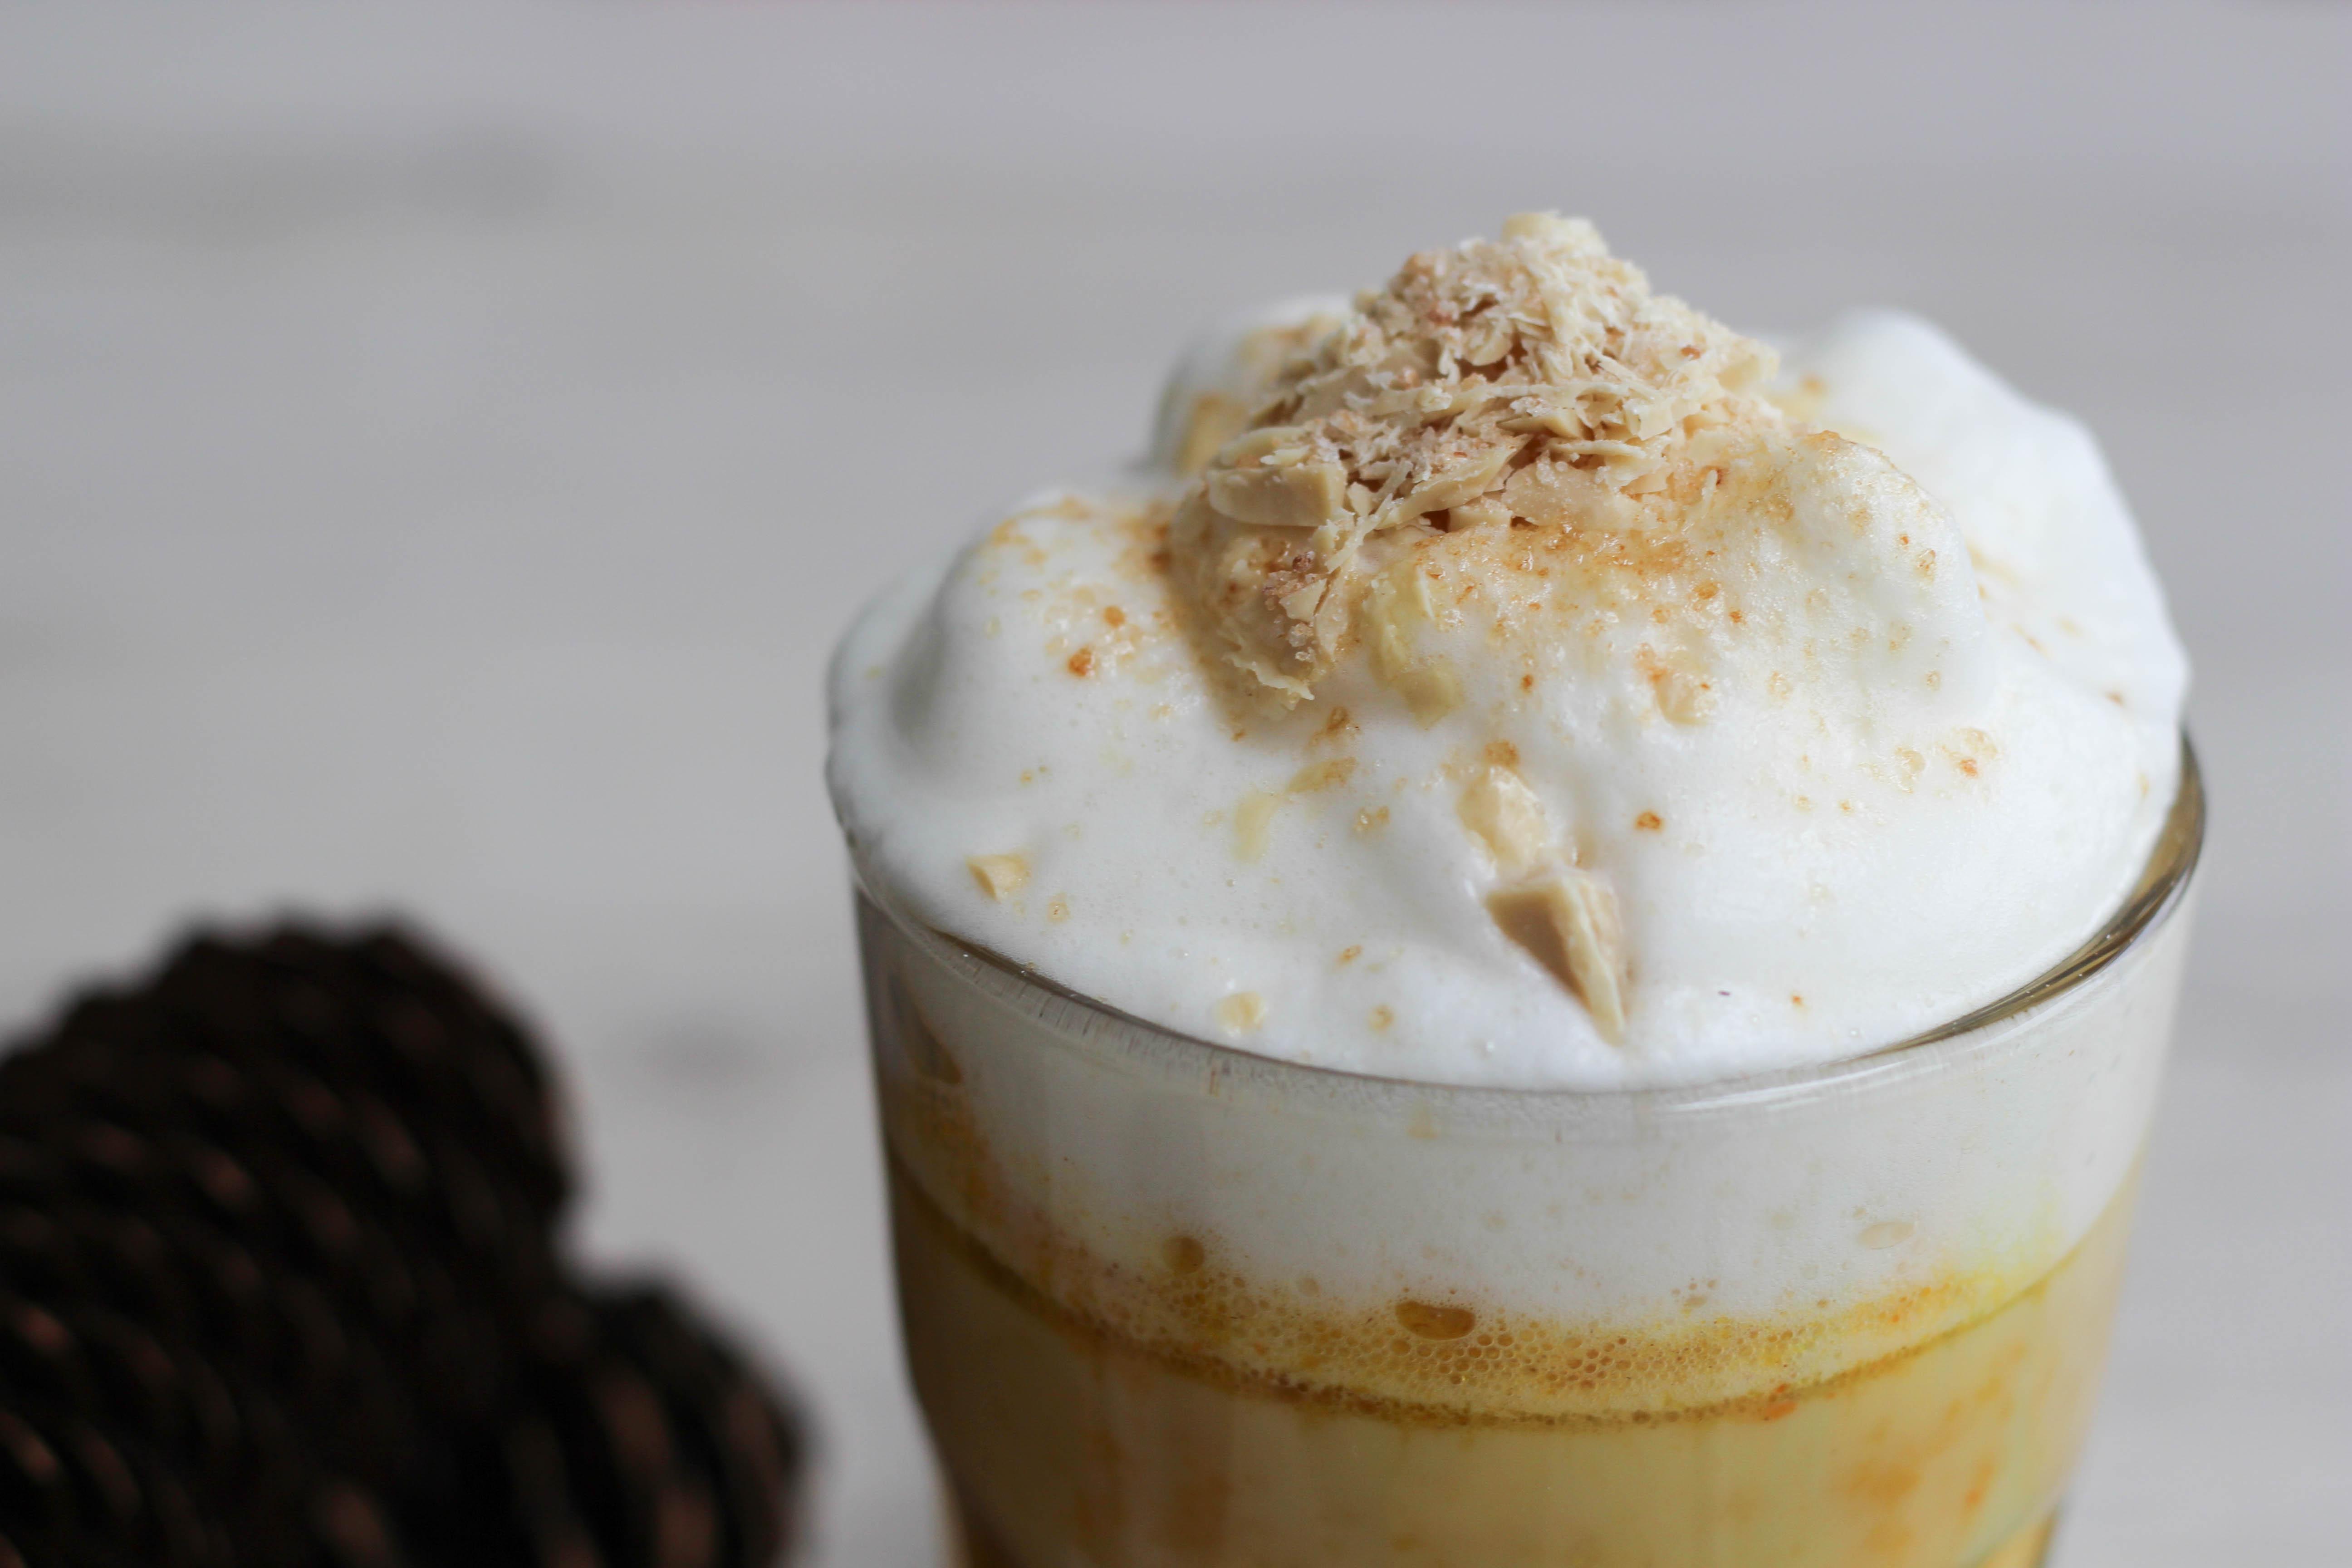 vegan-kuerbis-chai-latte-vegan-zimt-herbst-autumn